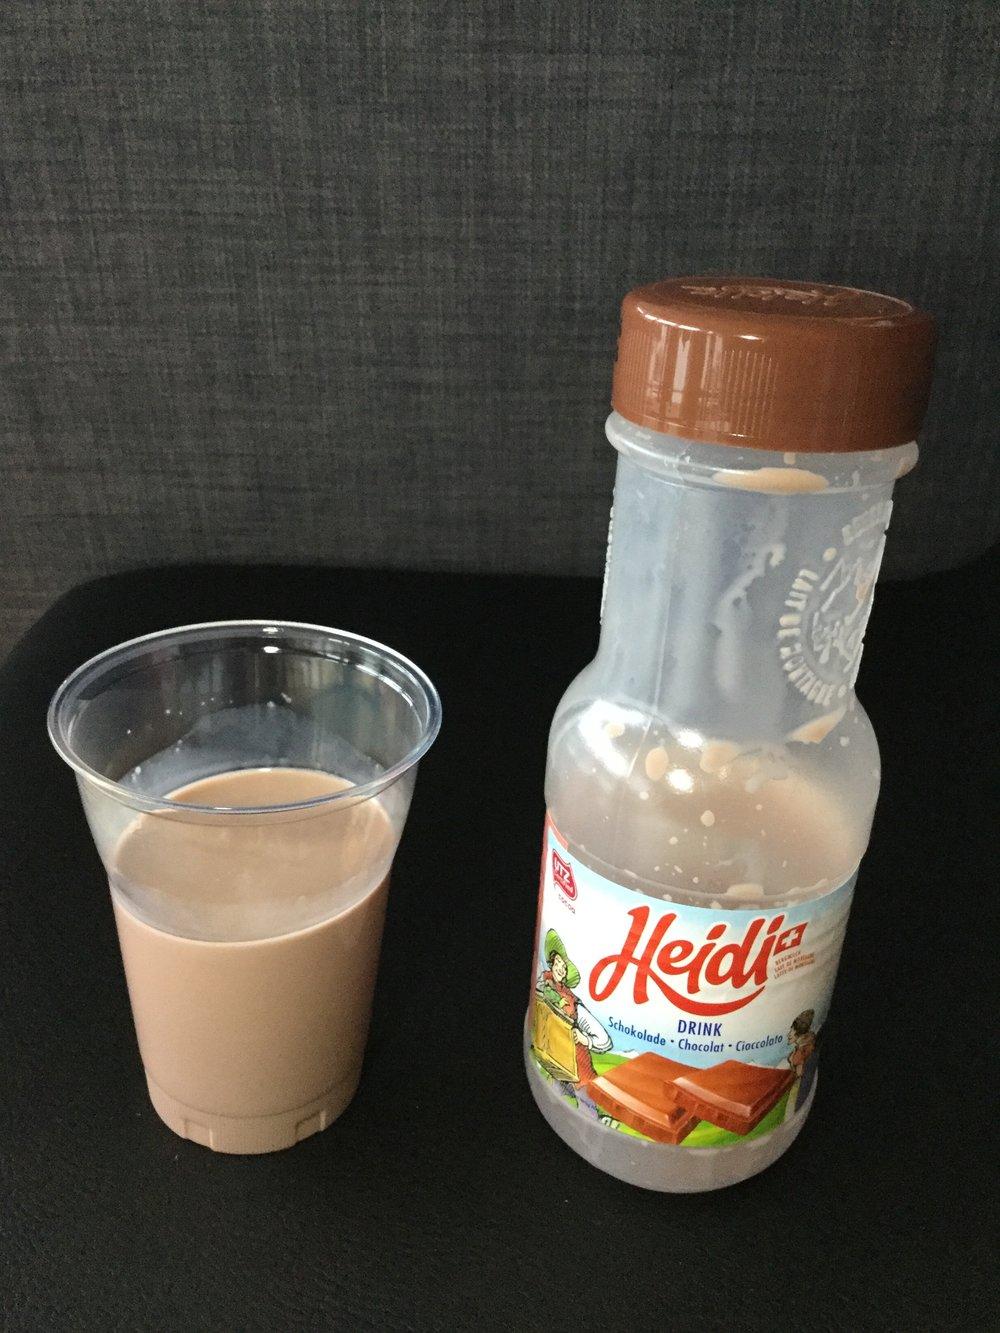 Heidi Drink Cup